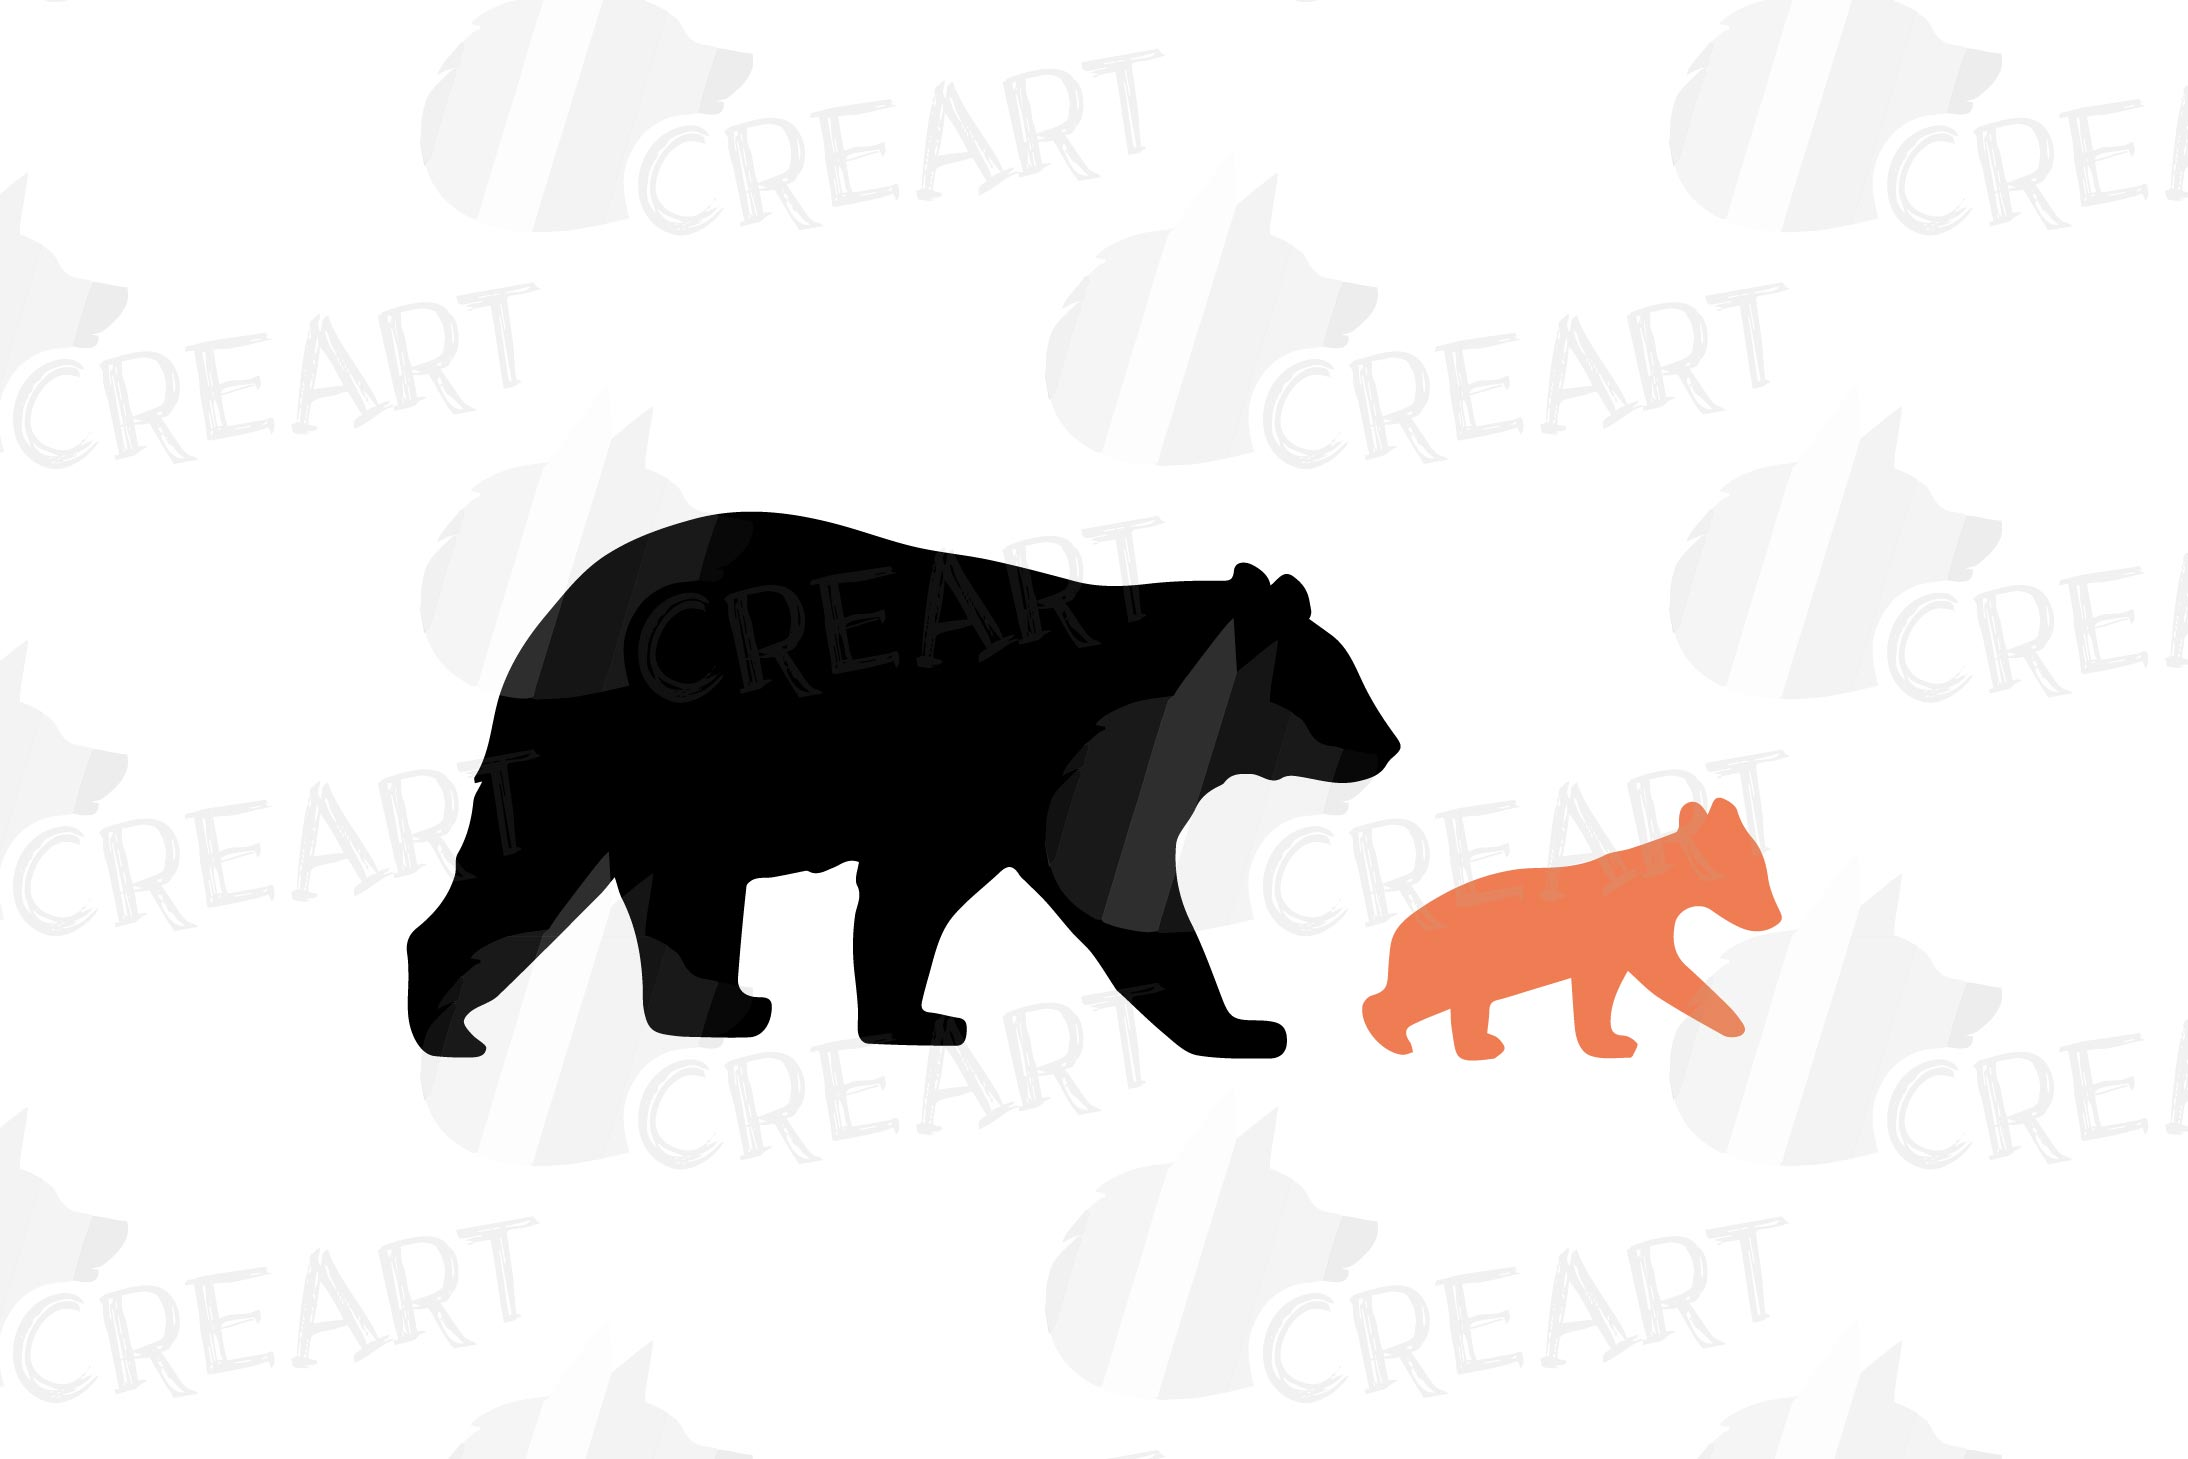 Baby and mama bear nursery clip art collection, bears print example image 3